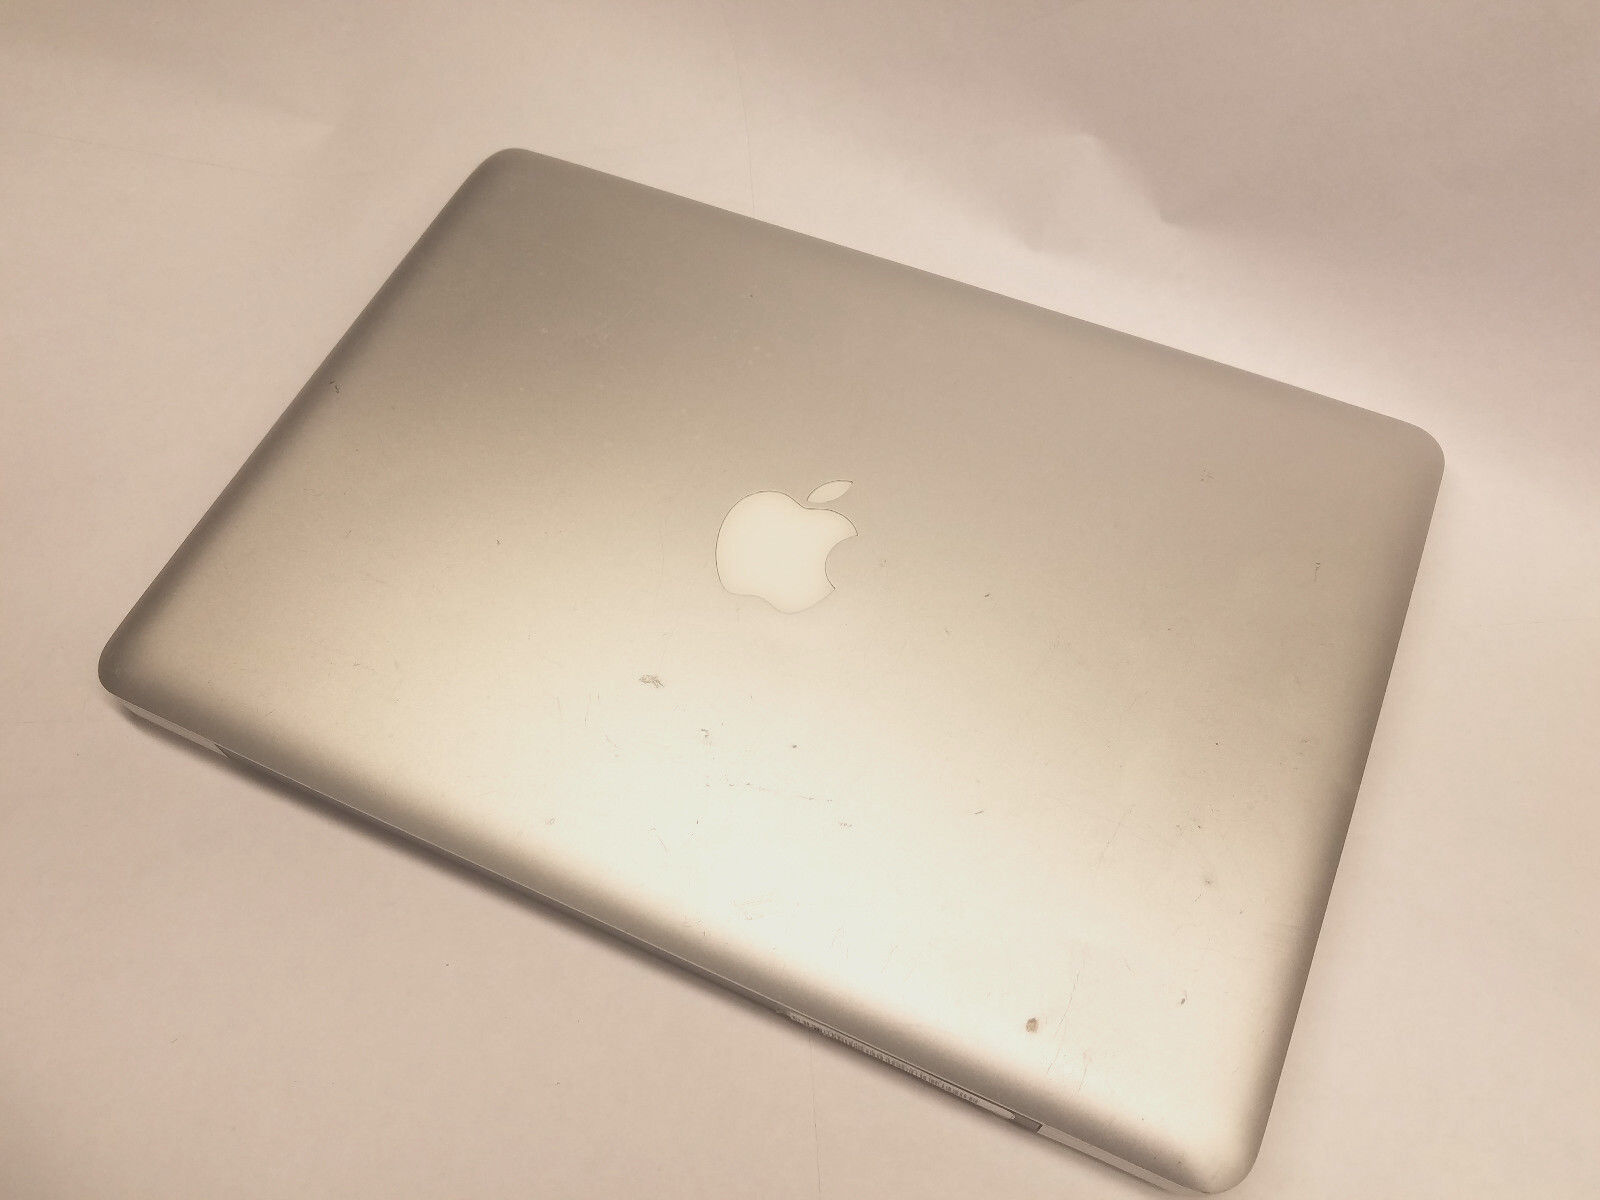 "Macbook Pro - Apple Macbook Pro 13"" Mid 2012 Laptop, 500GB i5 2.5GHZ"